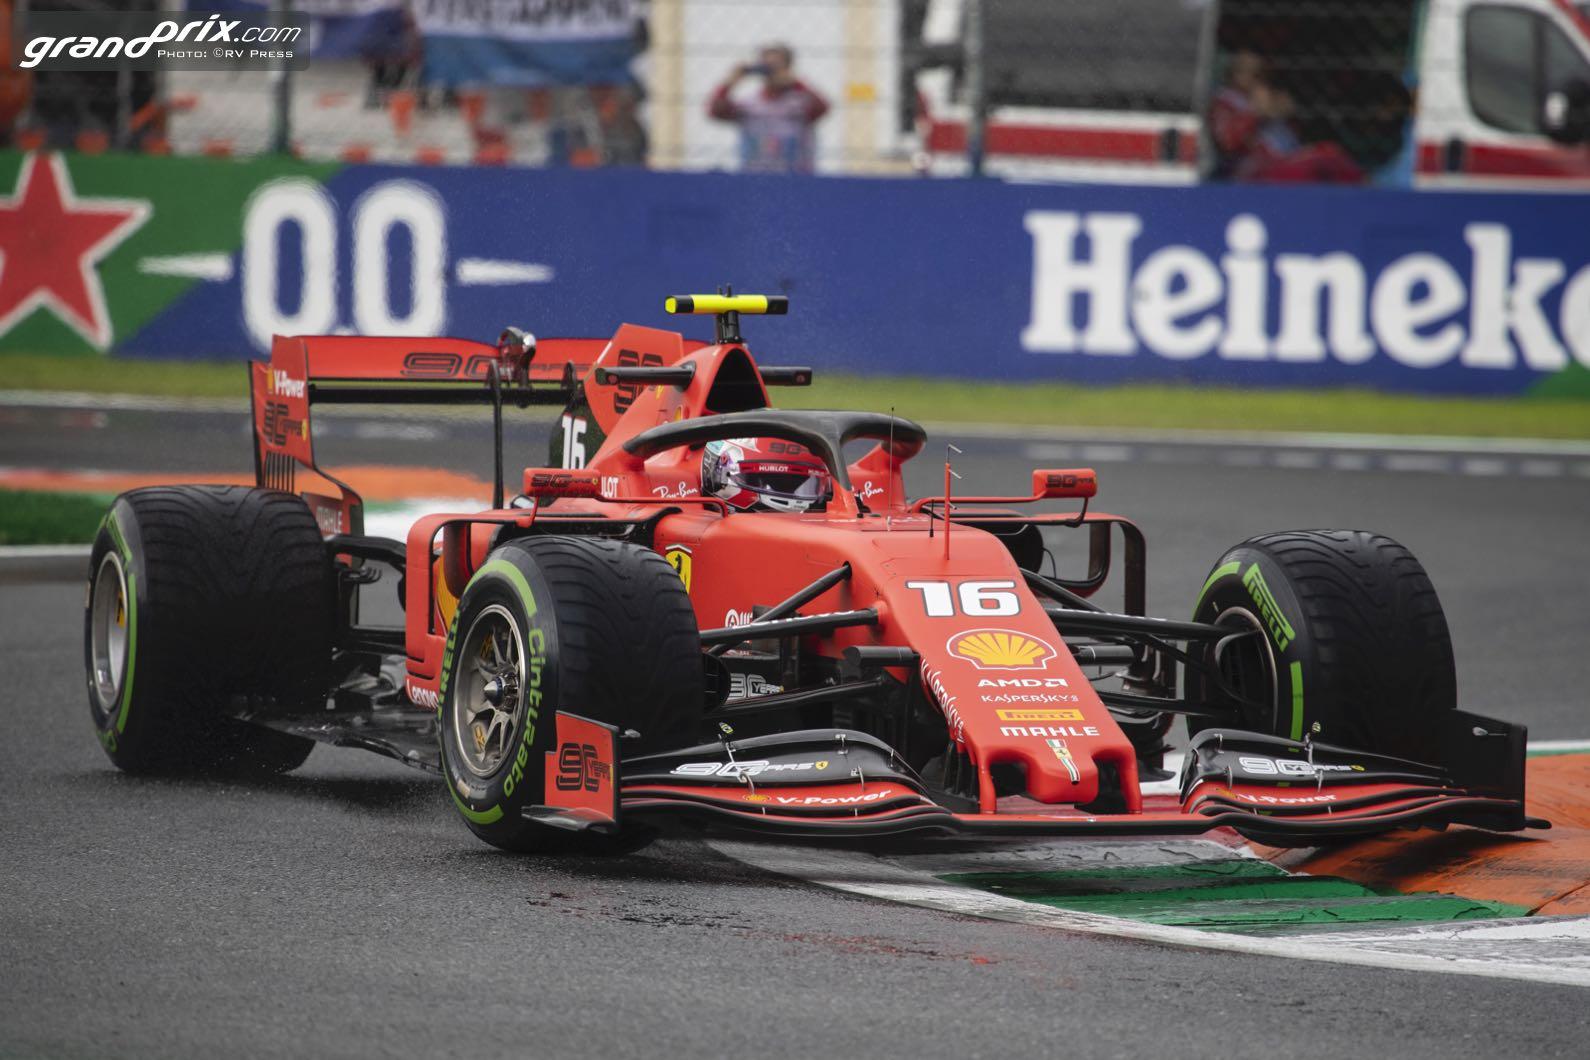 Sainz test would be in last year's Ferrari says Gene